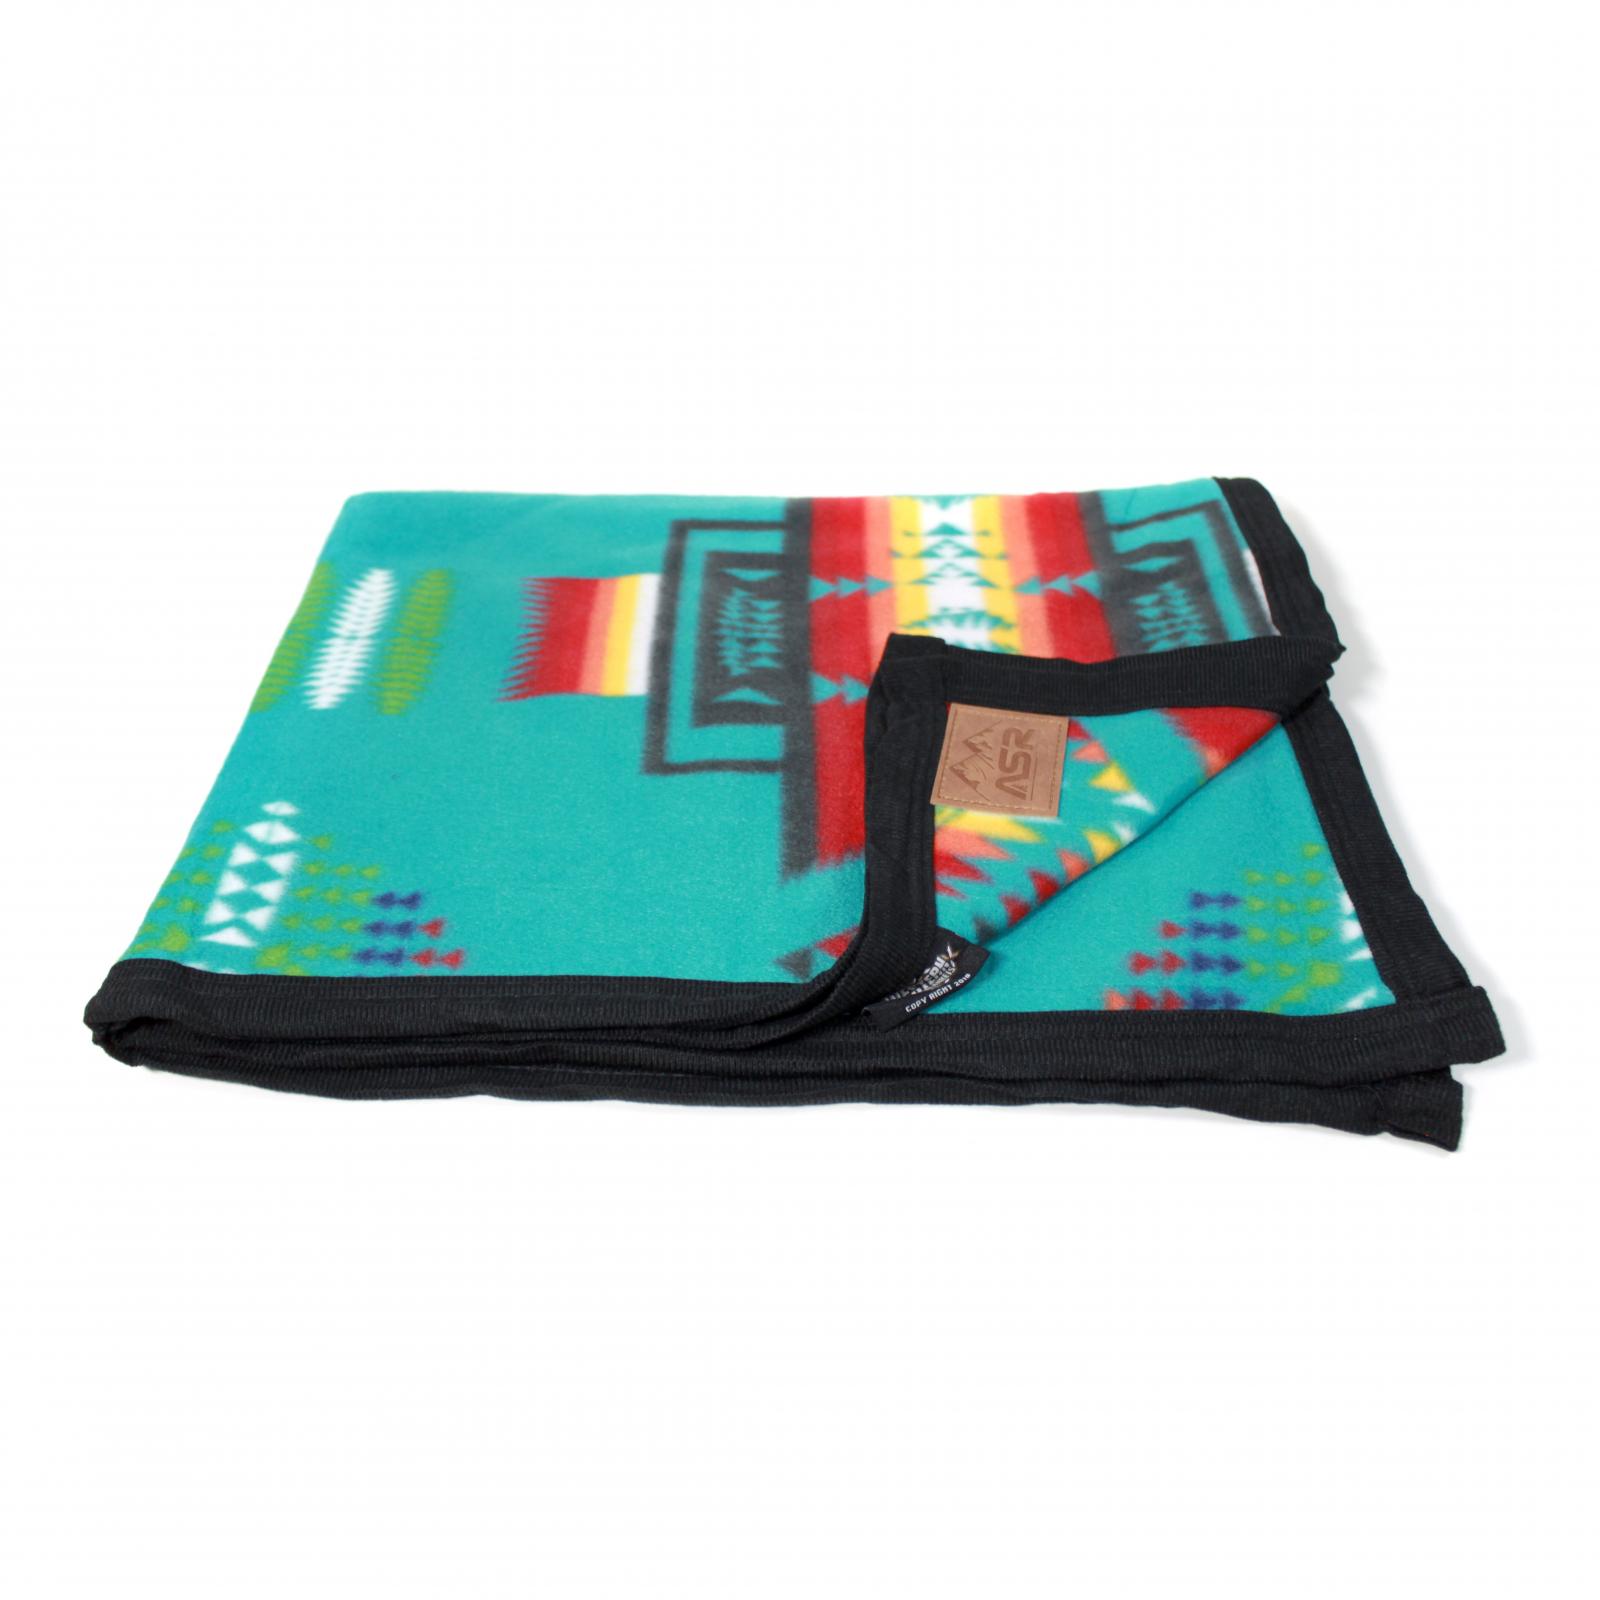 ASR Outdoor Southwest Style Fleece Blanket Full Turquoise